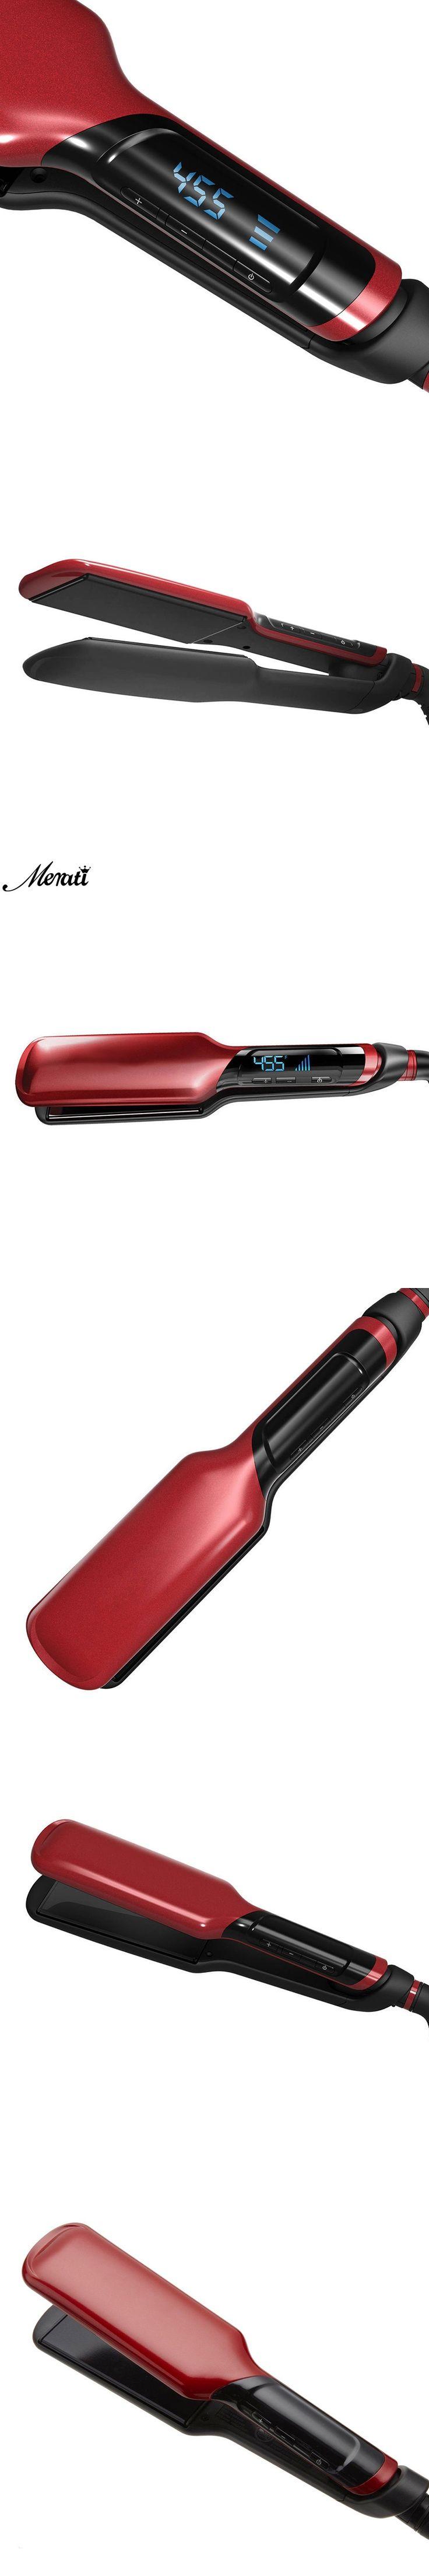 profesional Peine Alisador High Quality Professional Hair Salon  Straightener Thermoregulator Electric plancha pelo